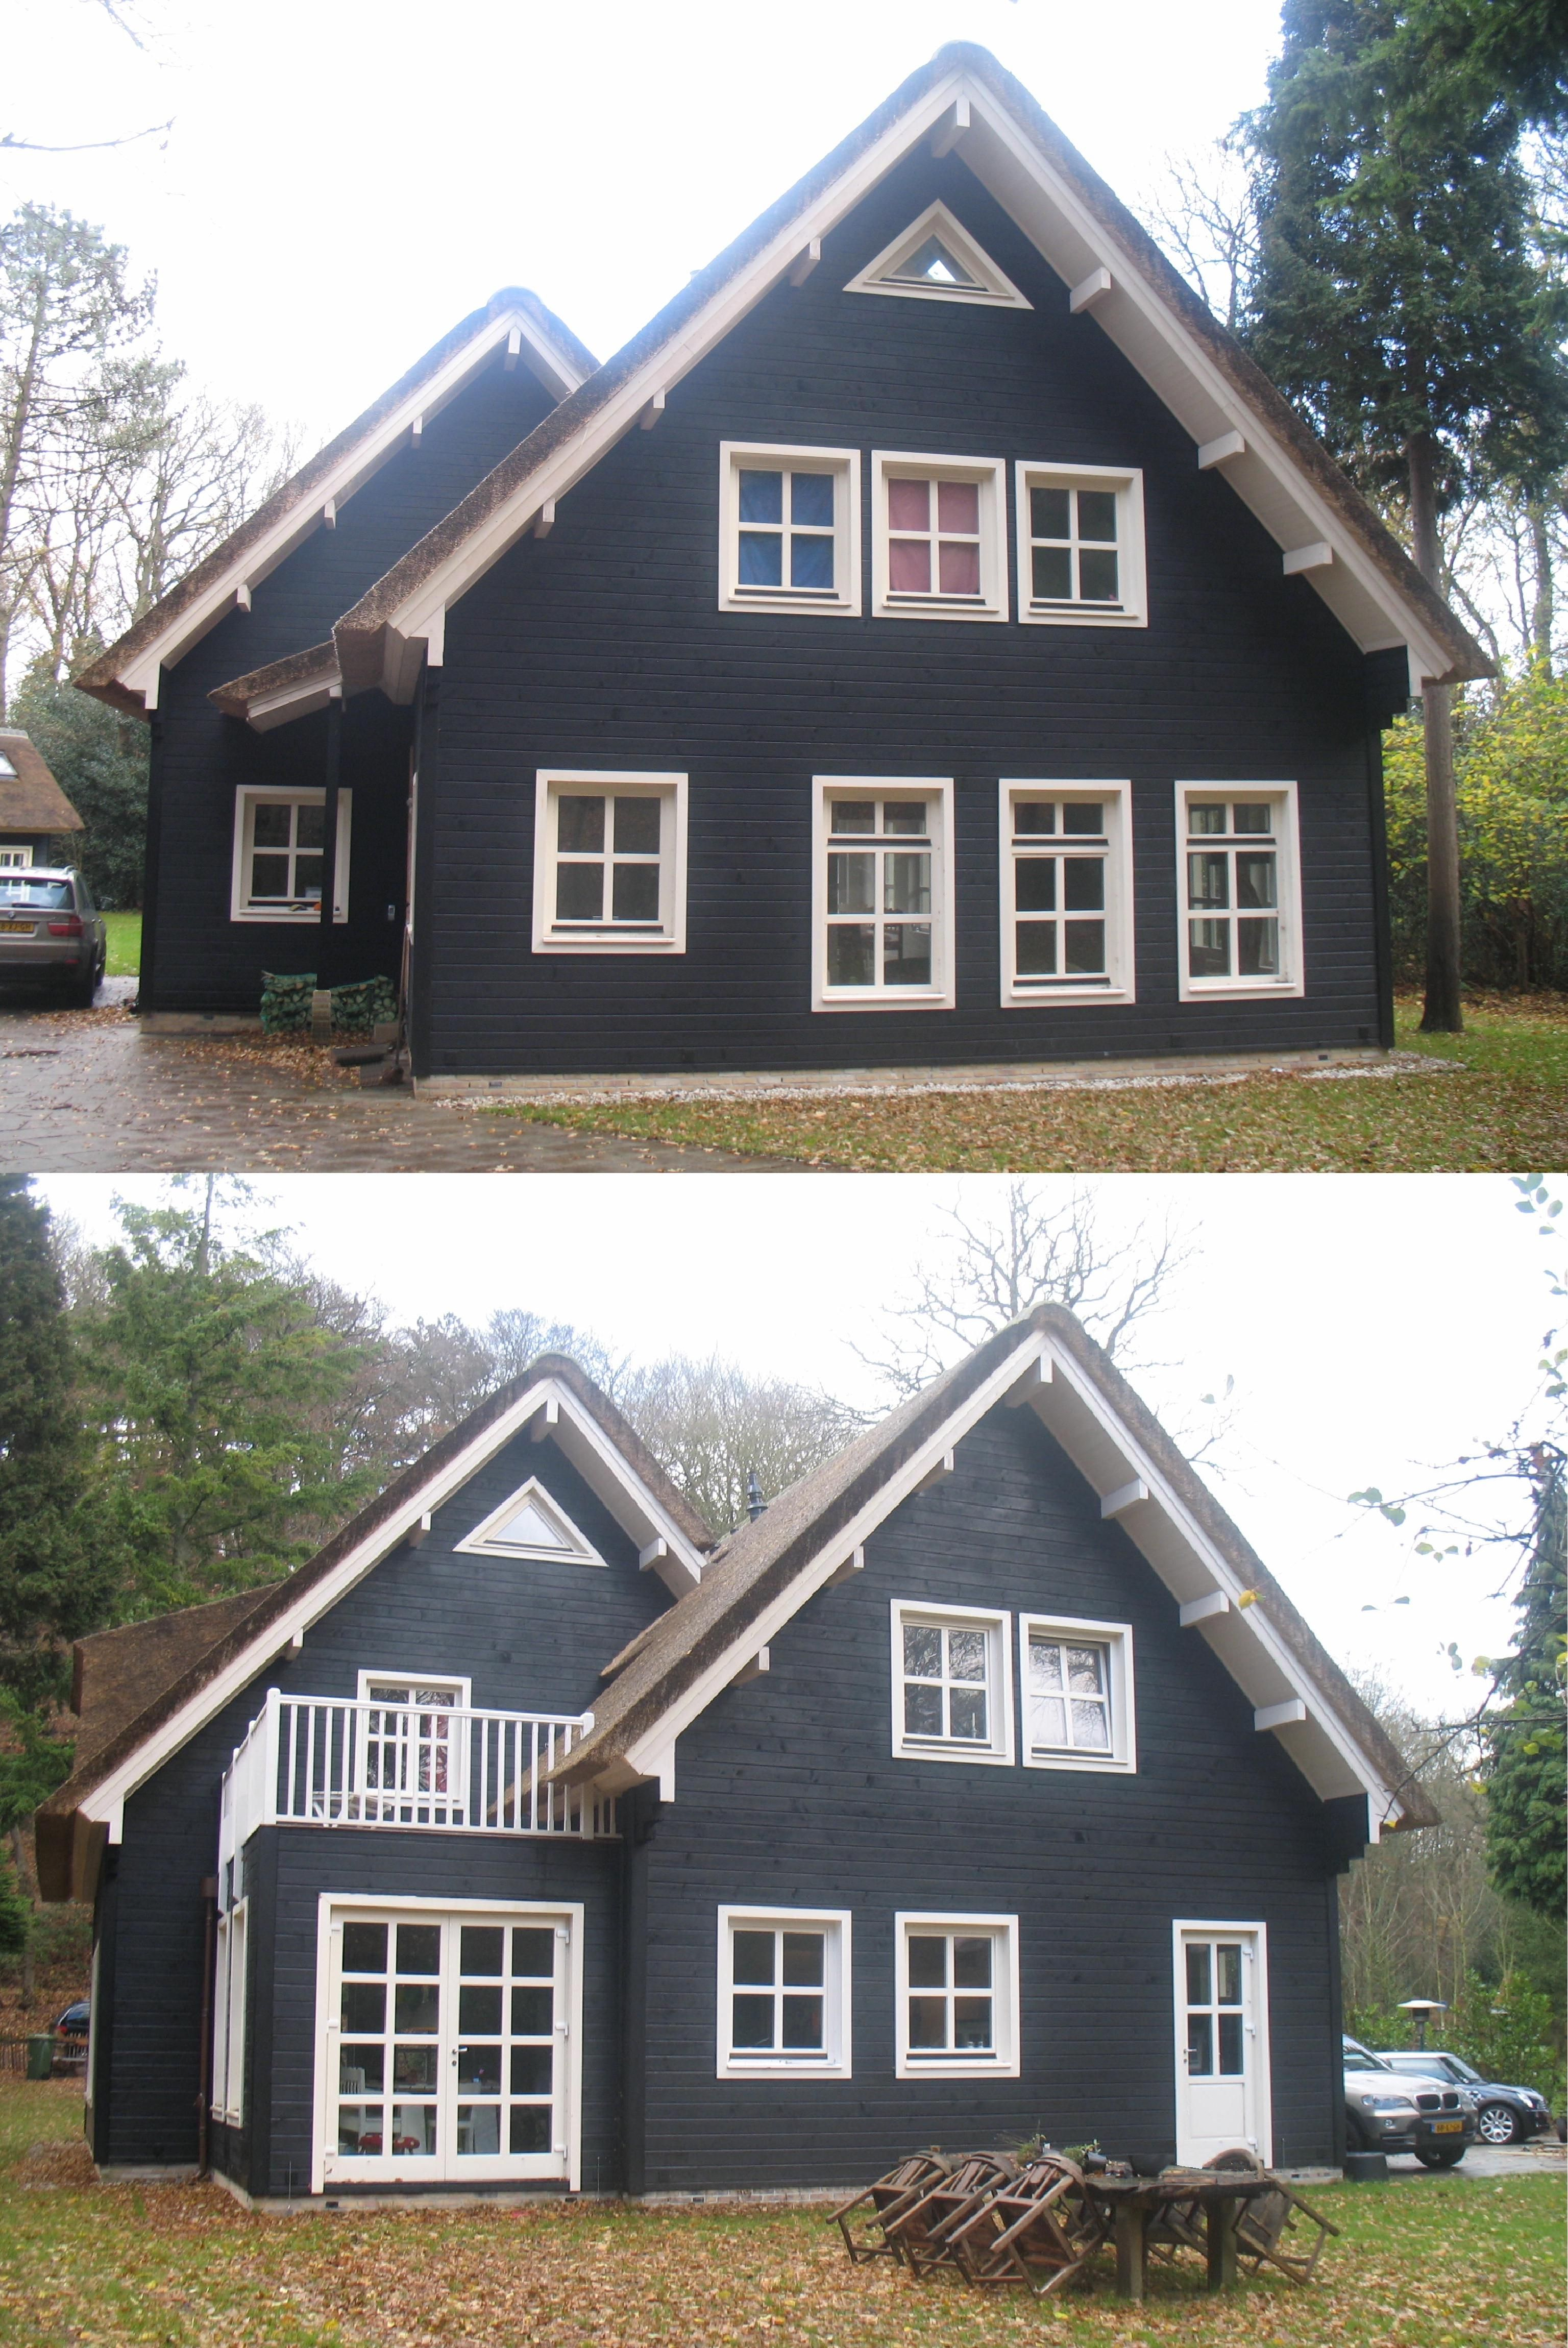 Droomhuis 3 England Housesexterior Paint Ideasblack